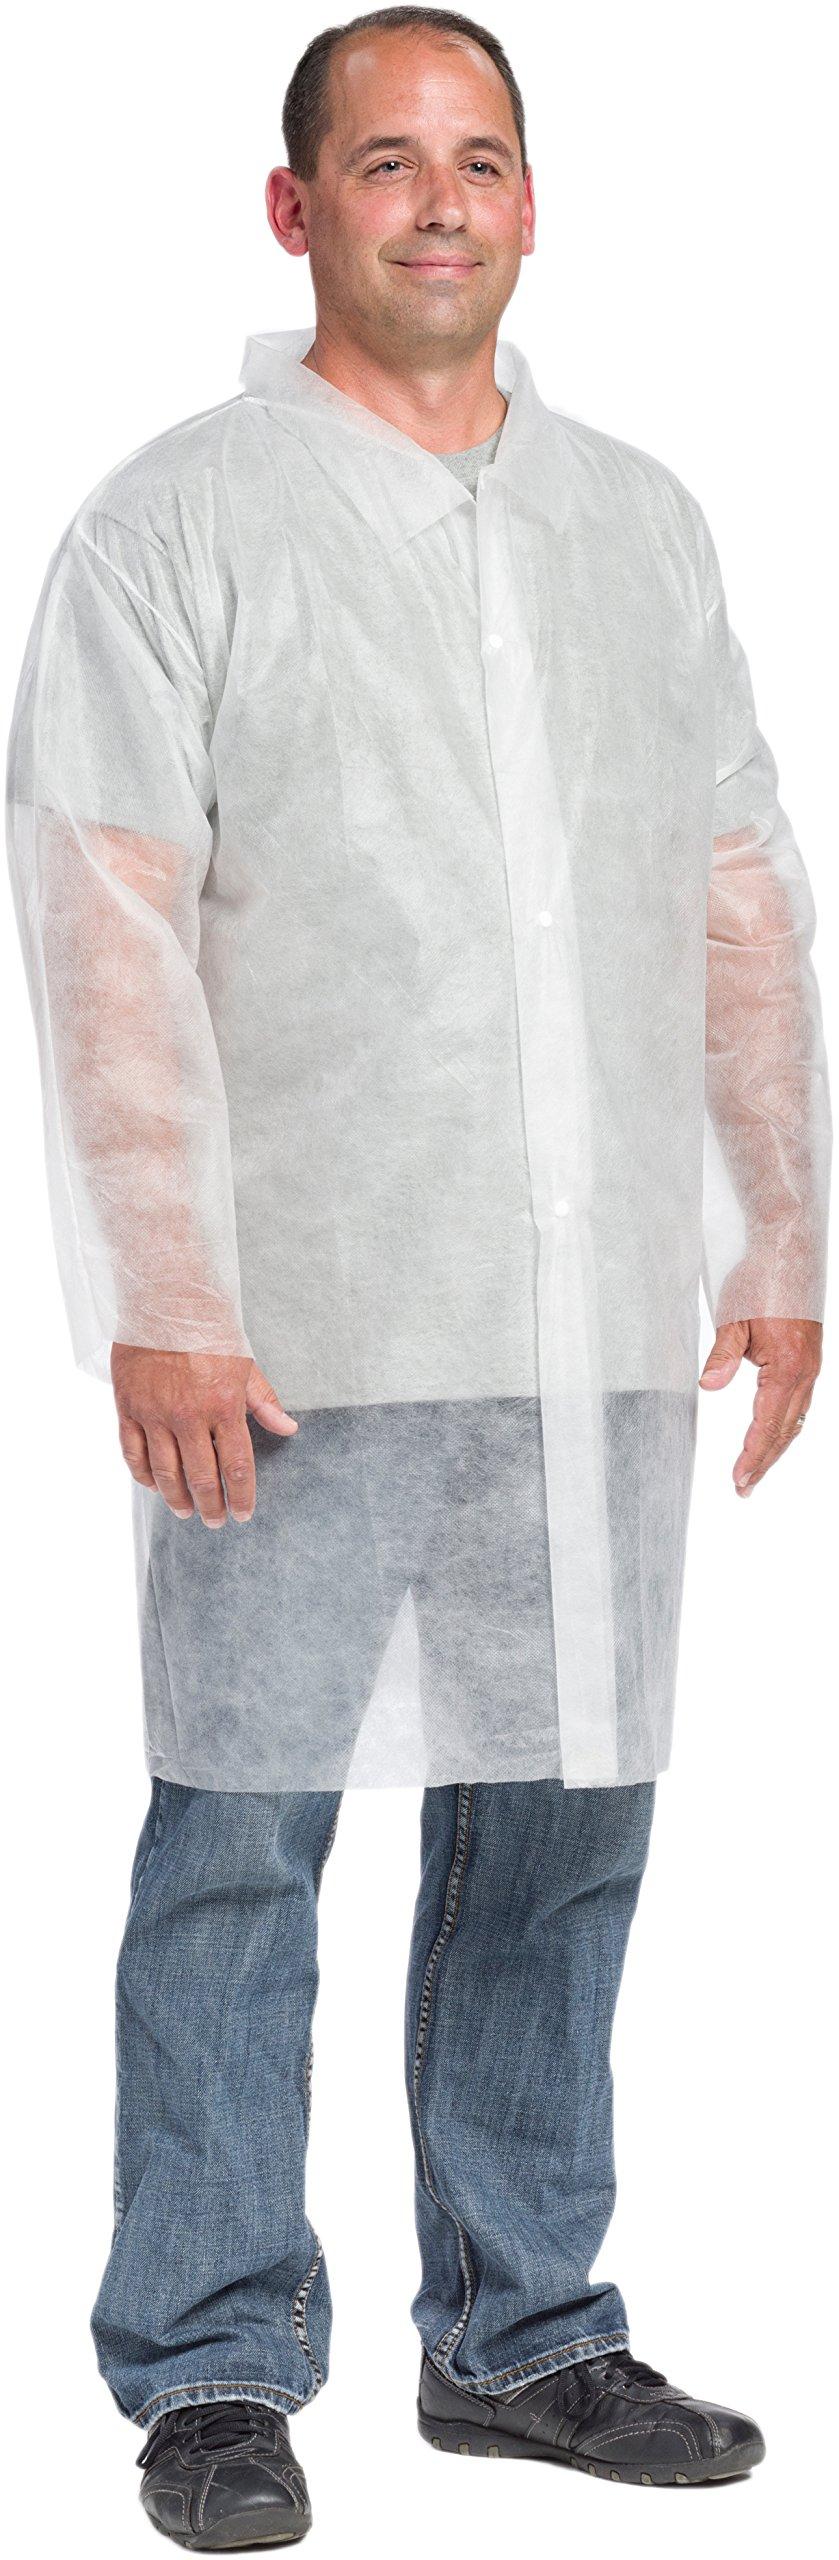 West Chester 3511 M Polypropylene Std.WGT. Sbp Lab Coat, No Pocket, White, Medium (Box of 30)